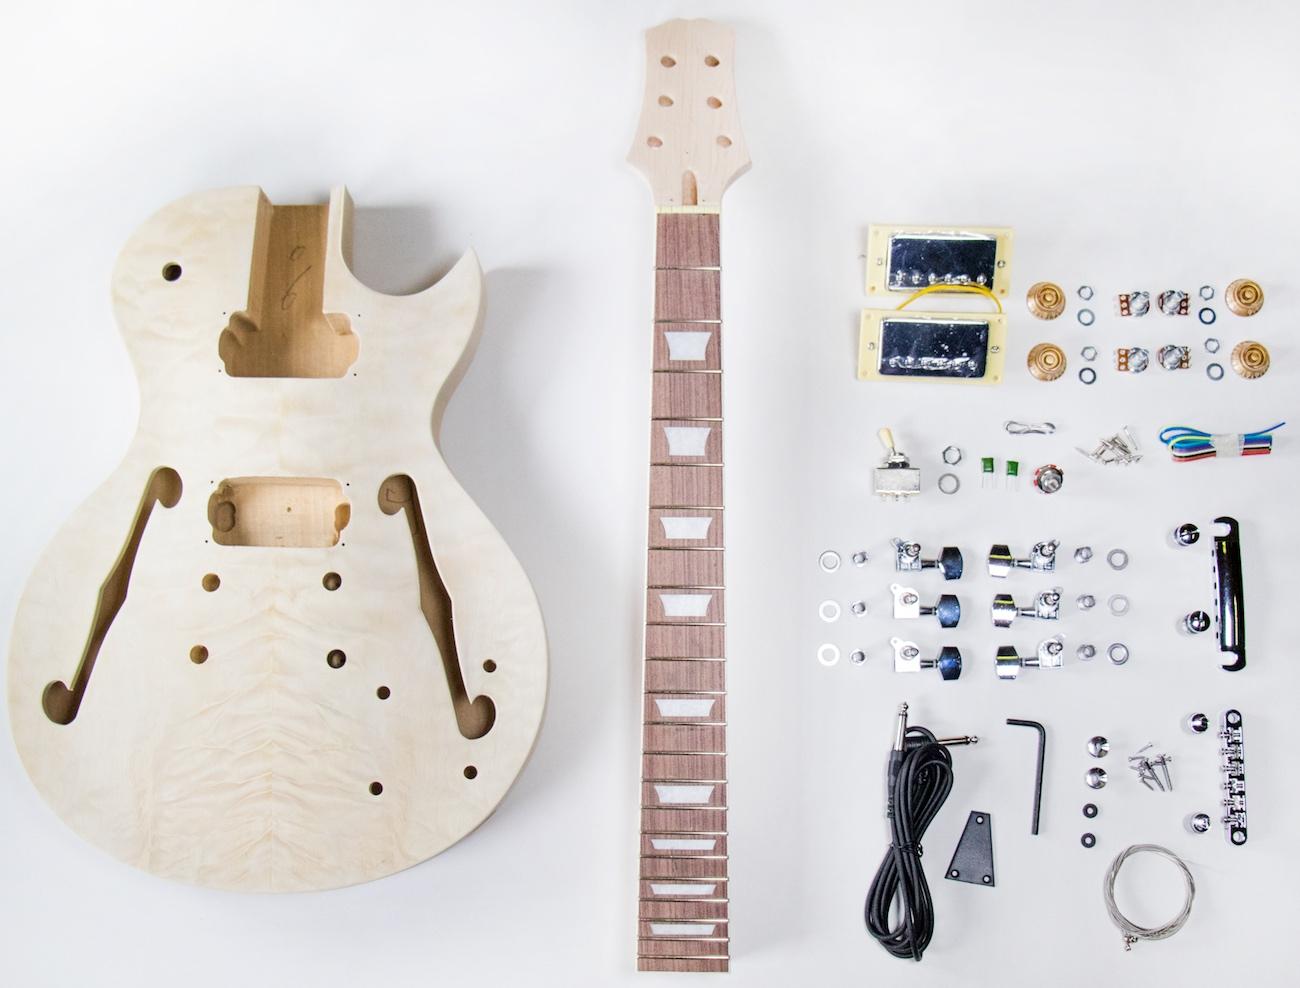 TheFretWire DIY Electric Guitar Kit - SemiHollow LP